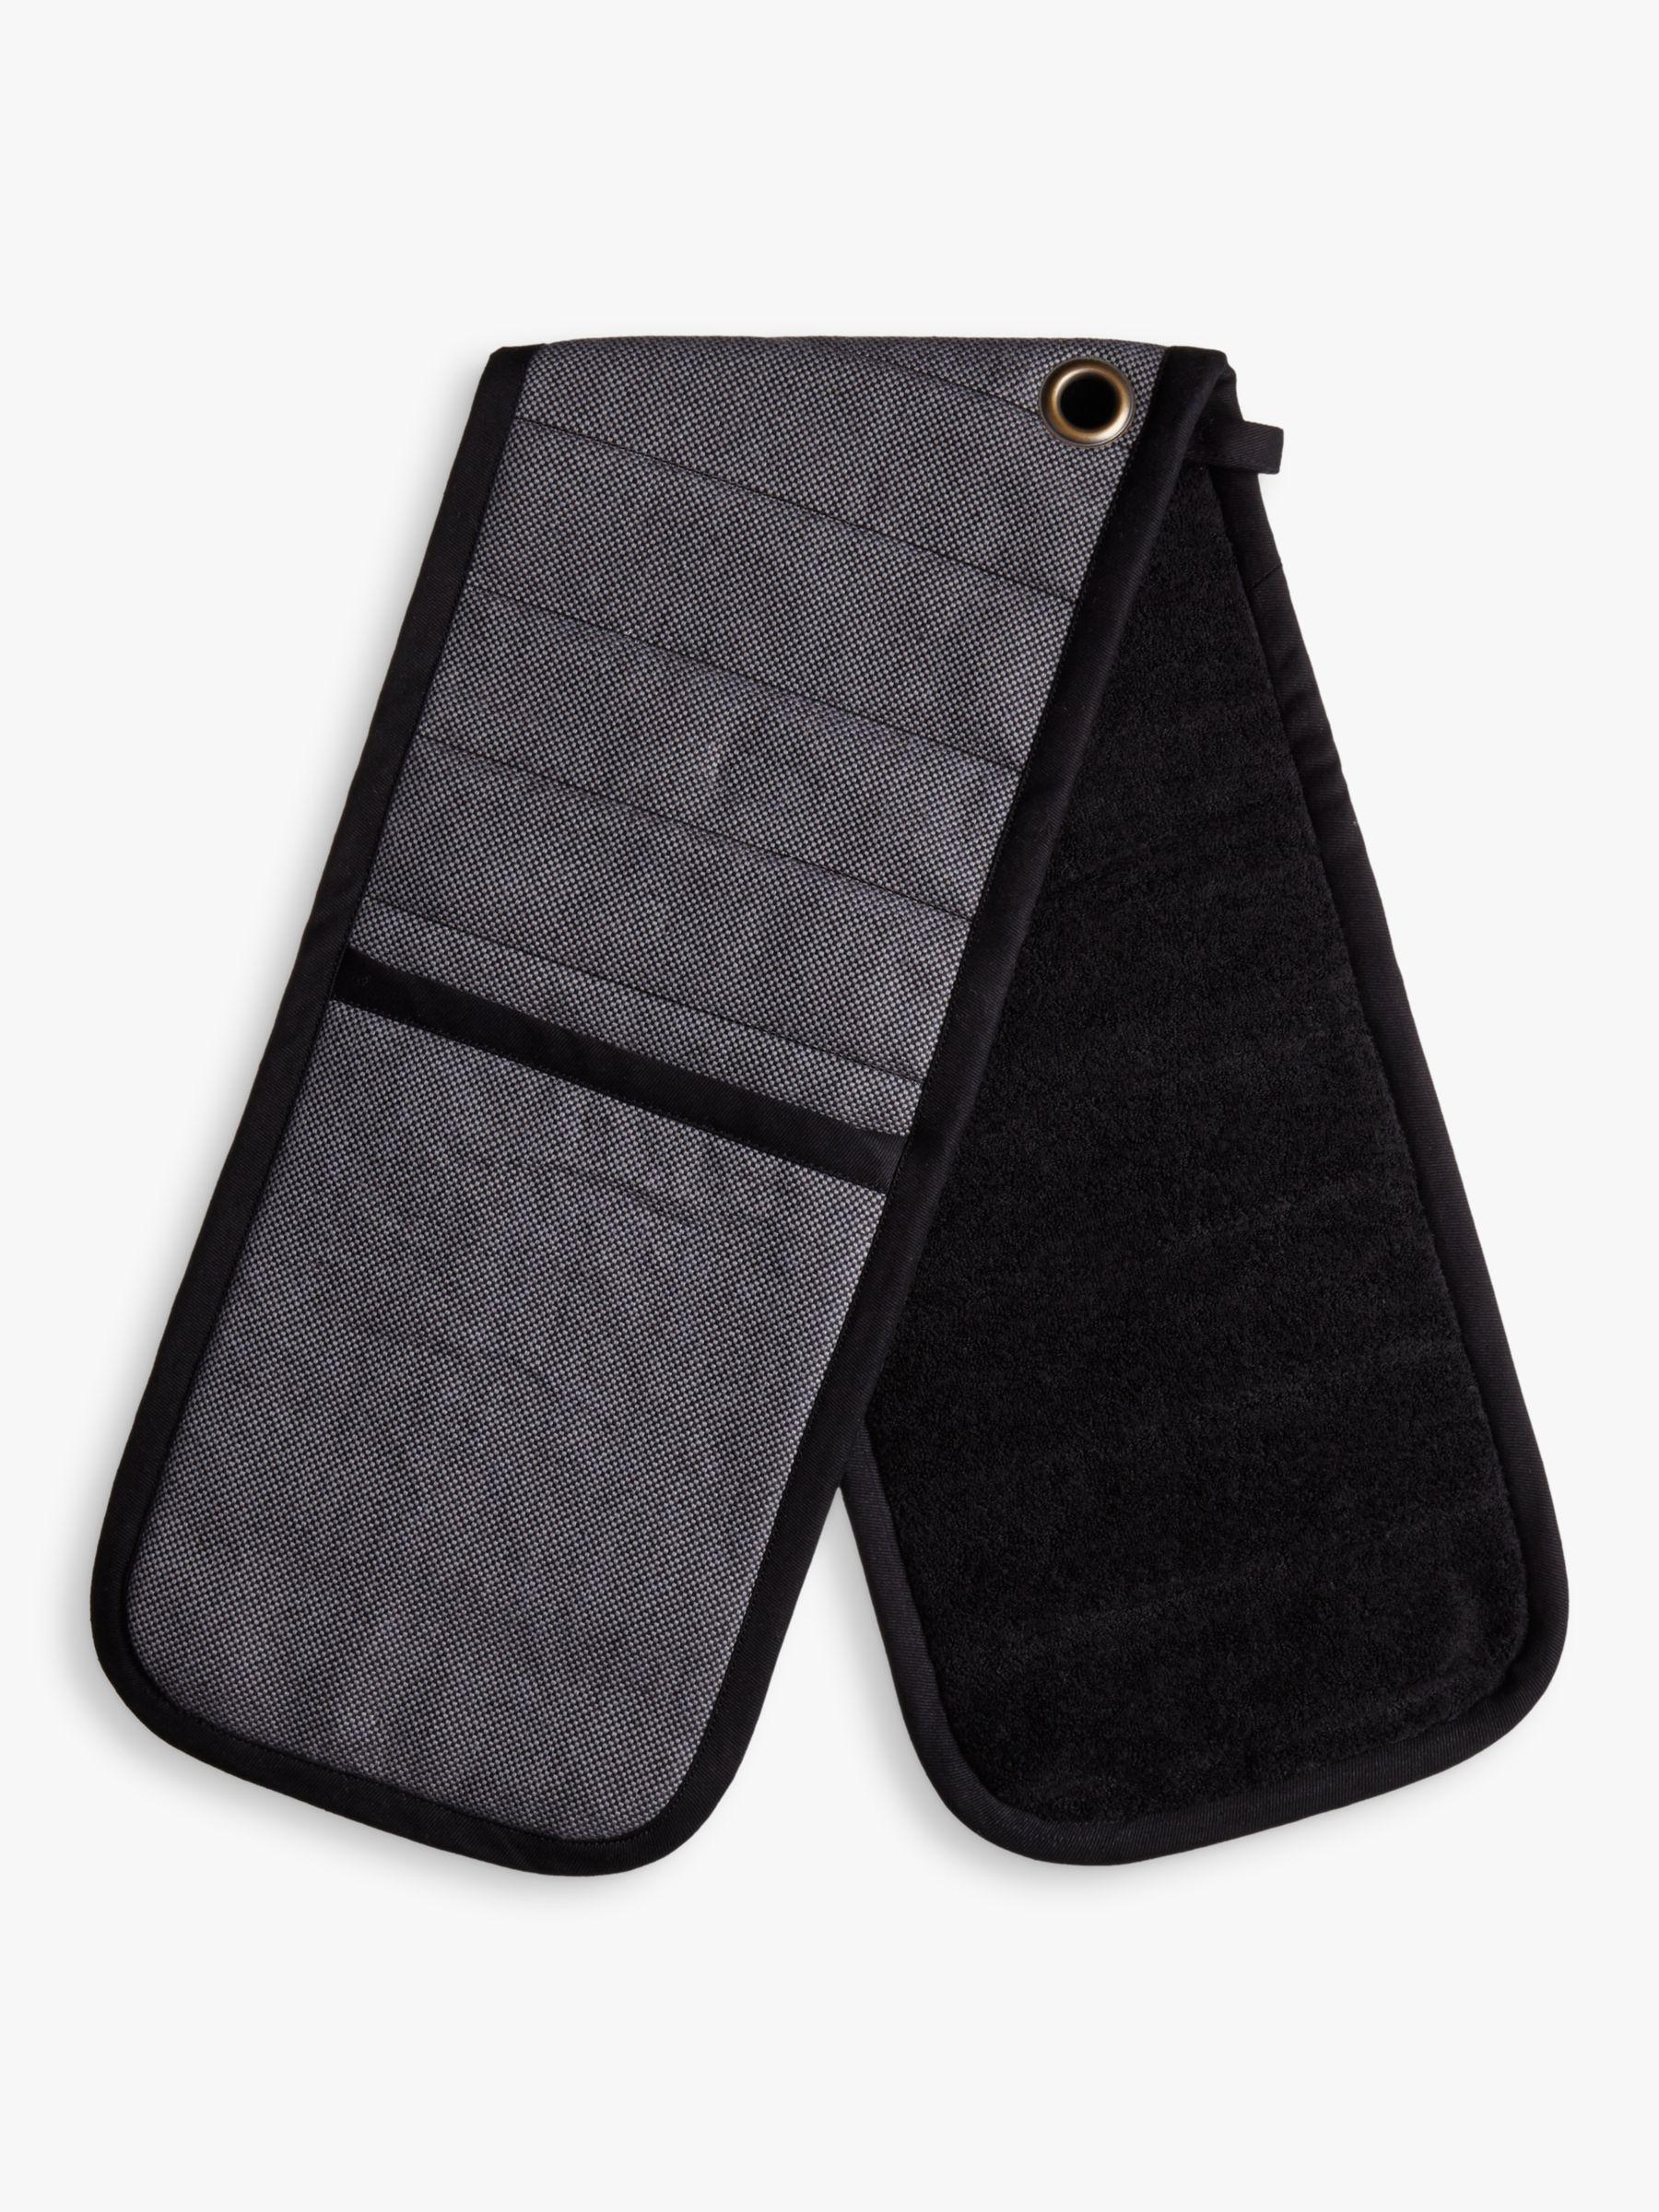 Black oven gloves john lewis - Black Oven Gloves John Lewis 3